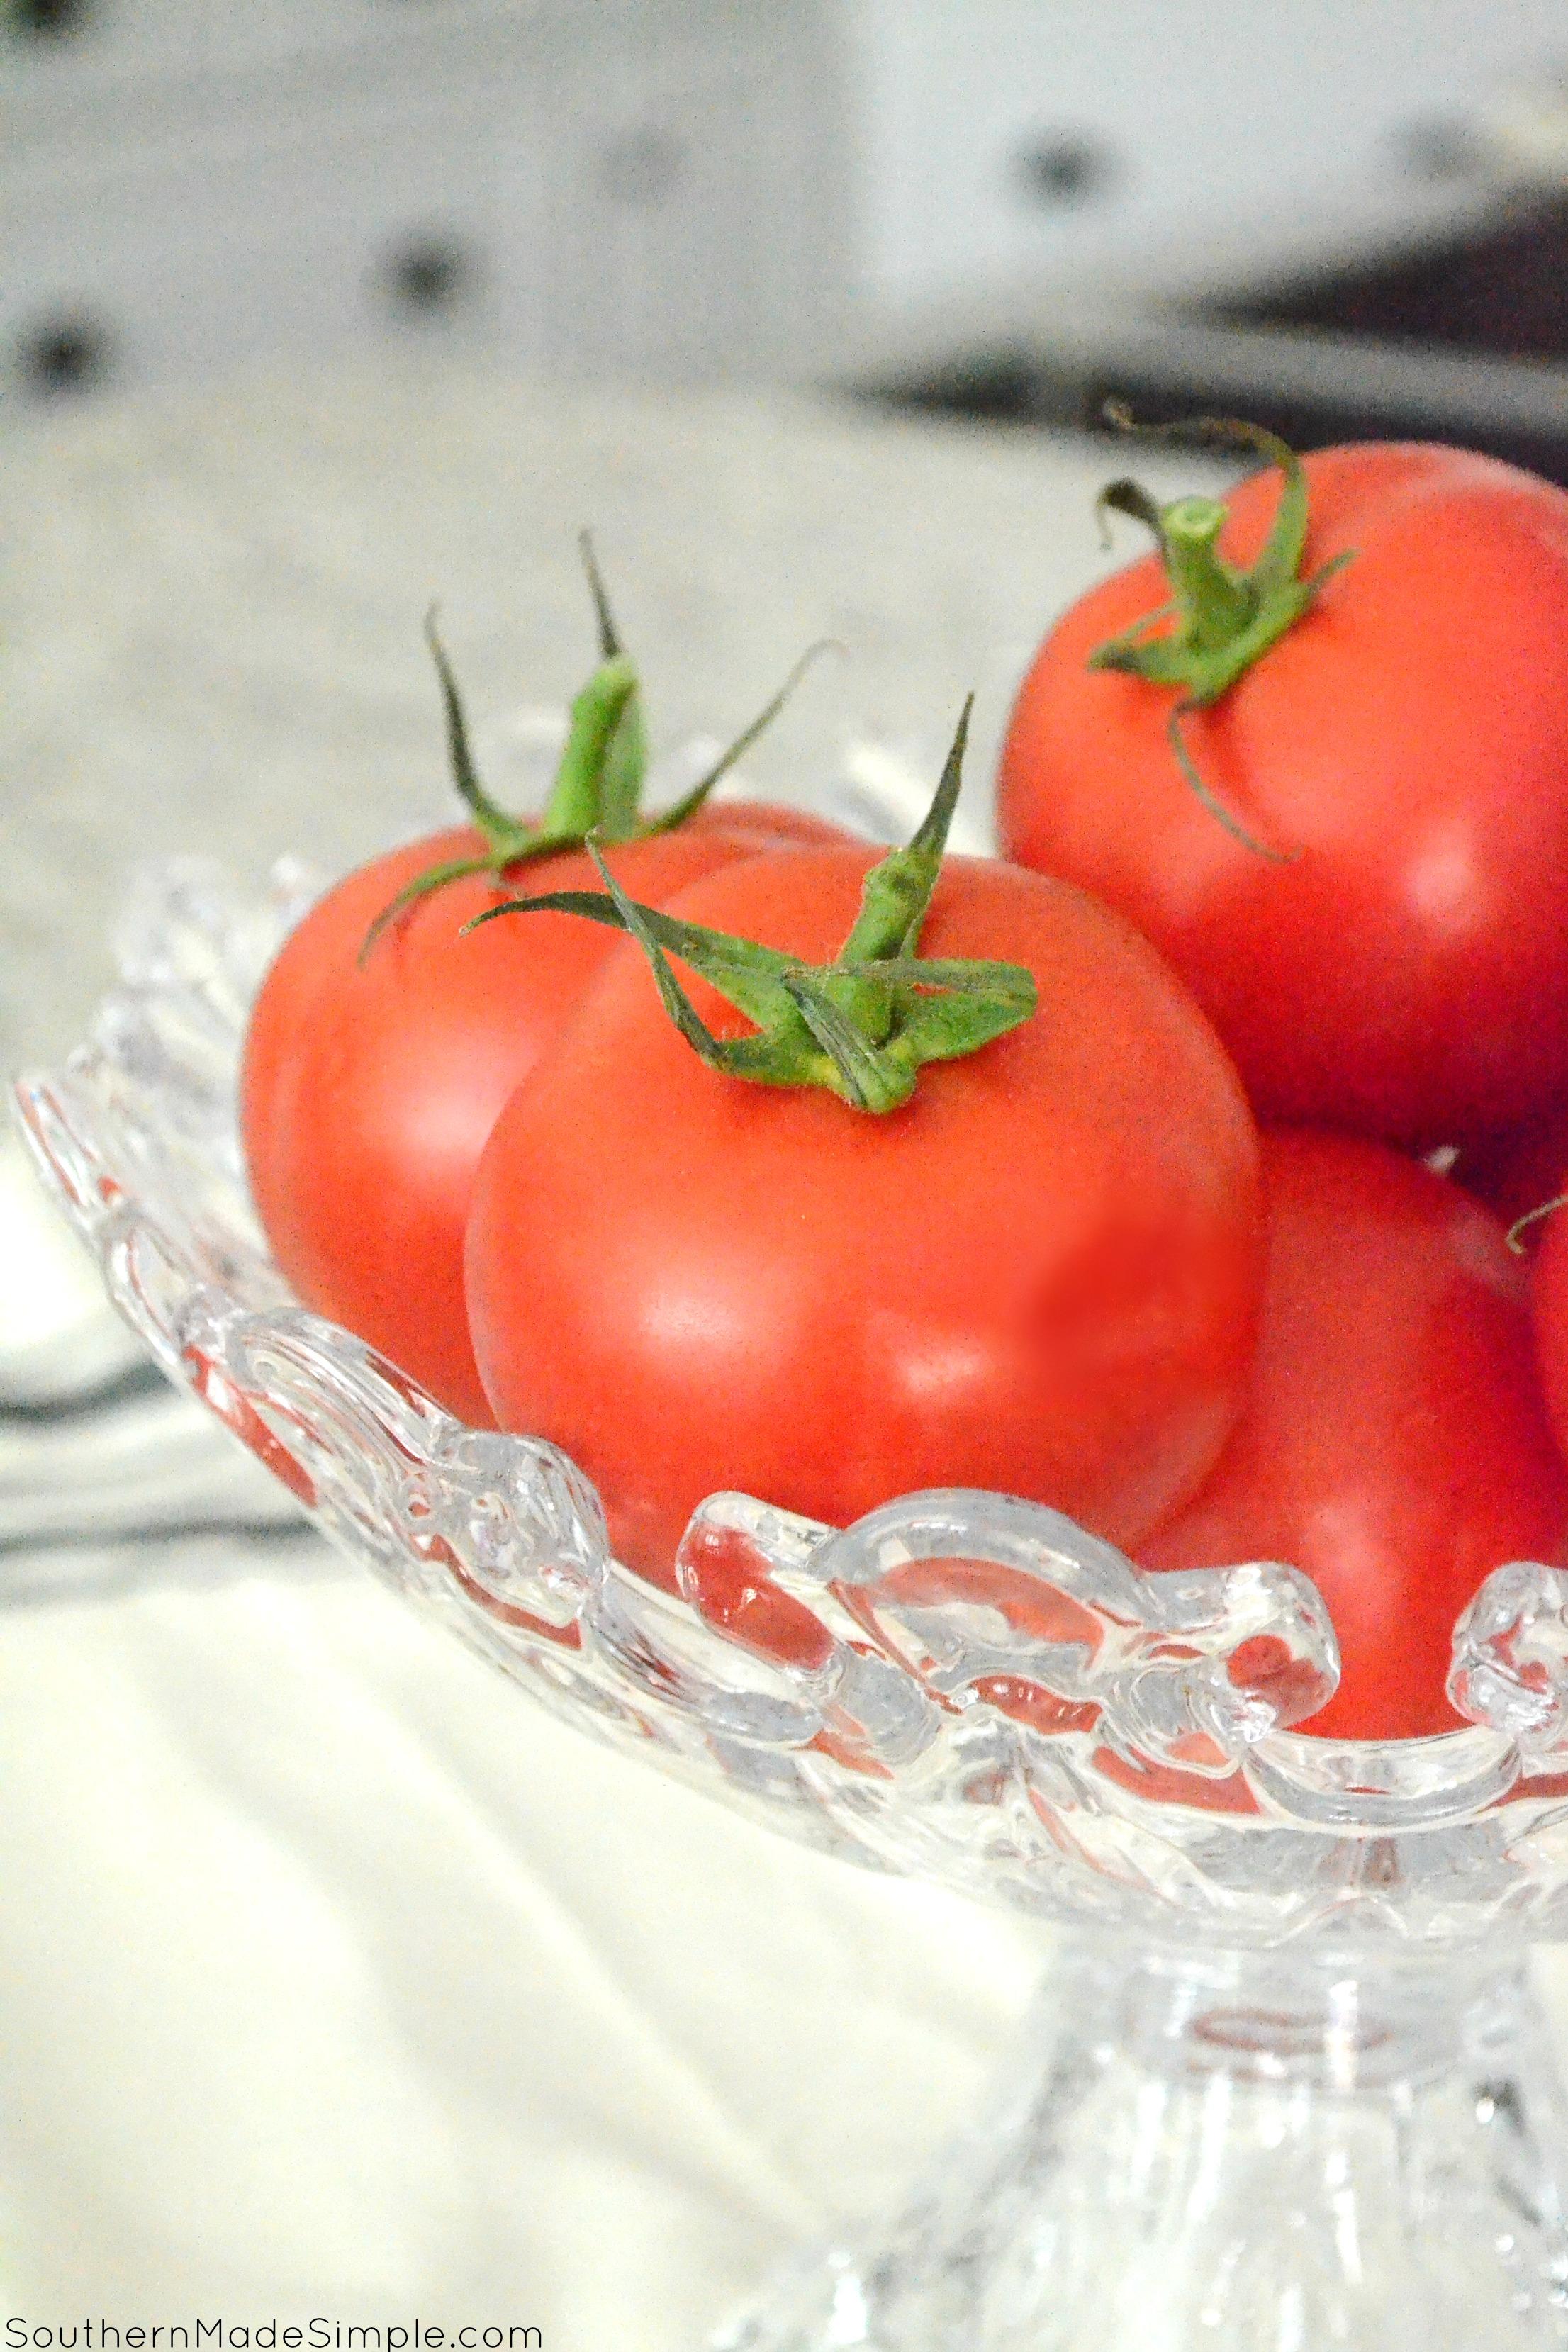 Broccoli & Cheddar Stuffed Tomatoes #VeggieSwapIns #IC #ad